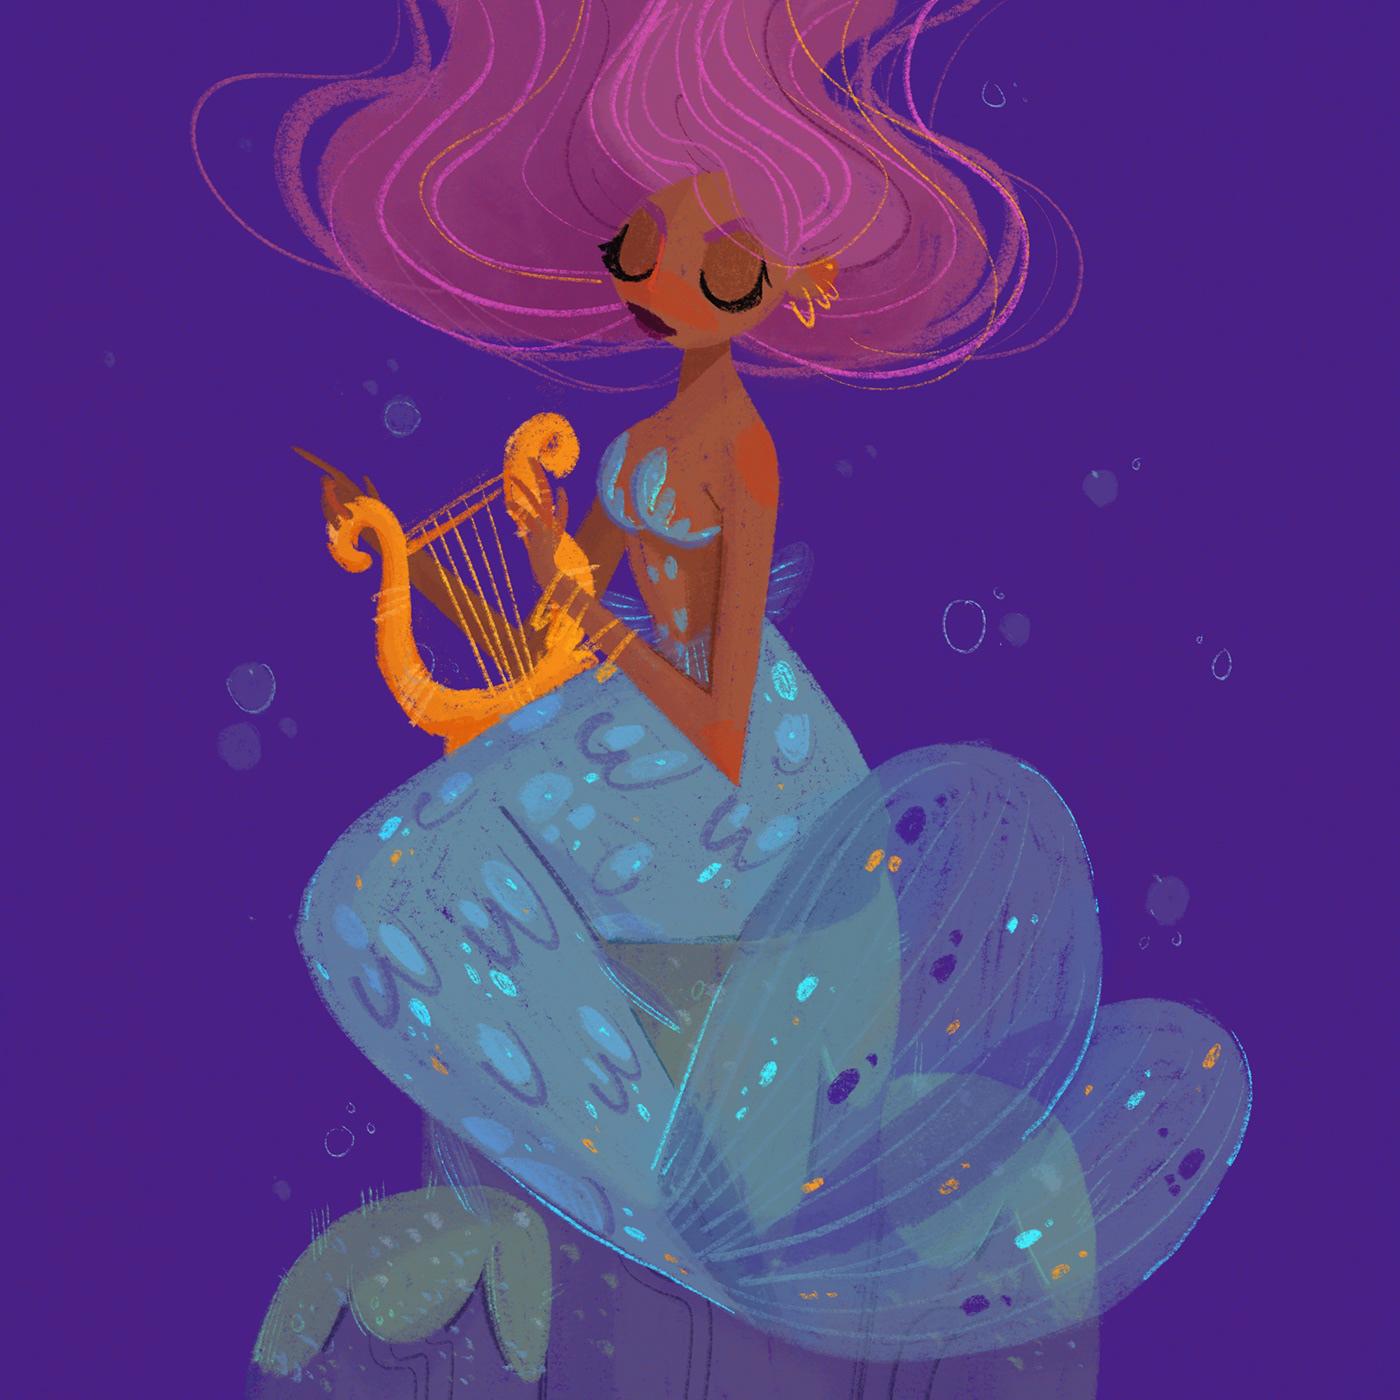 mermay mermaid sea fish Procreate girl